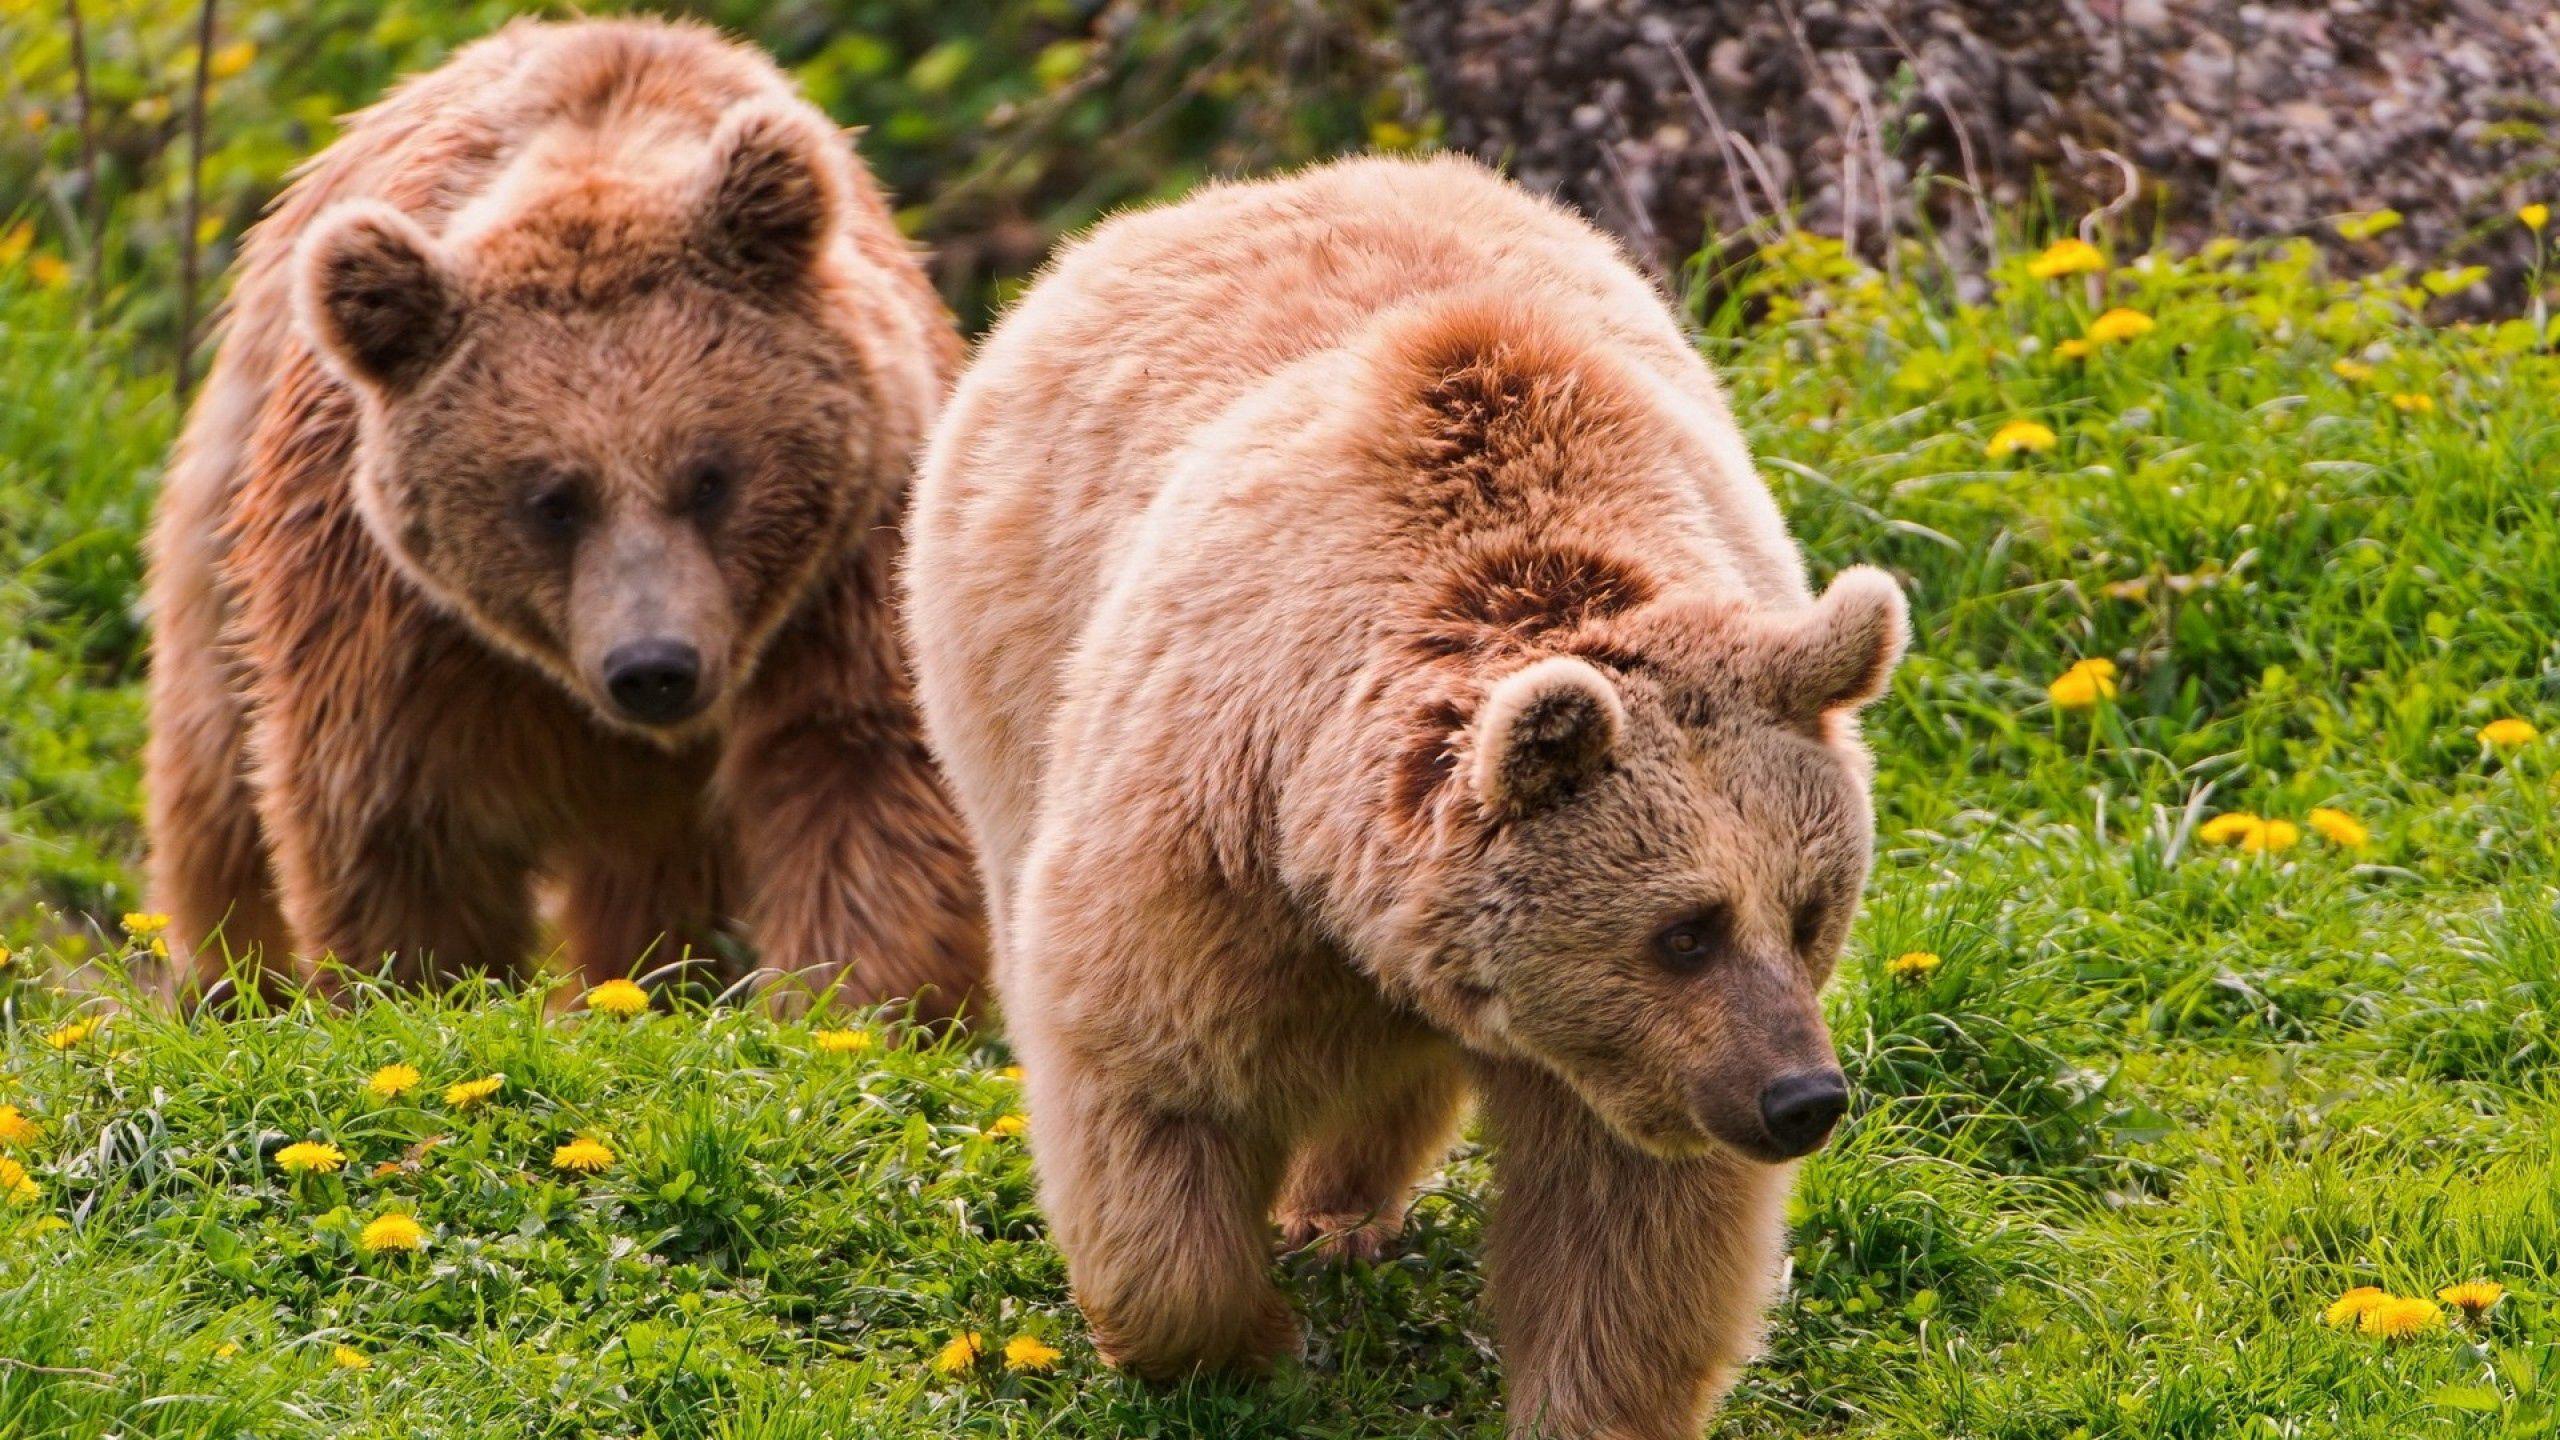 106455 Заставки и Обои Медведи на телефон. Скачать Животные, Трава, Медведи, Пара, Прогулка картинки бесплатно